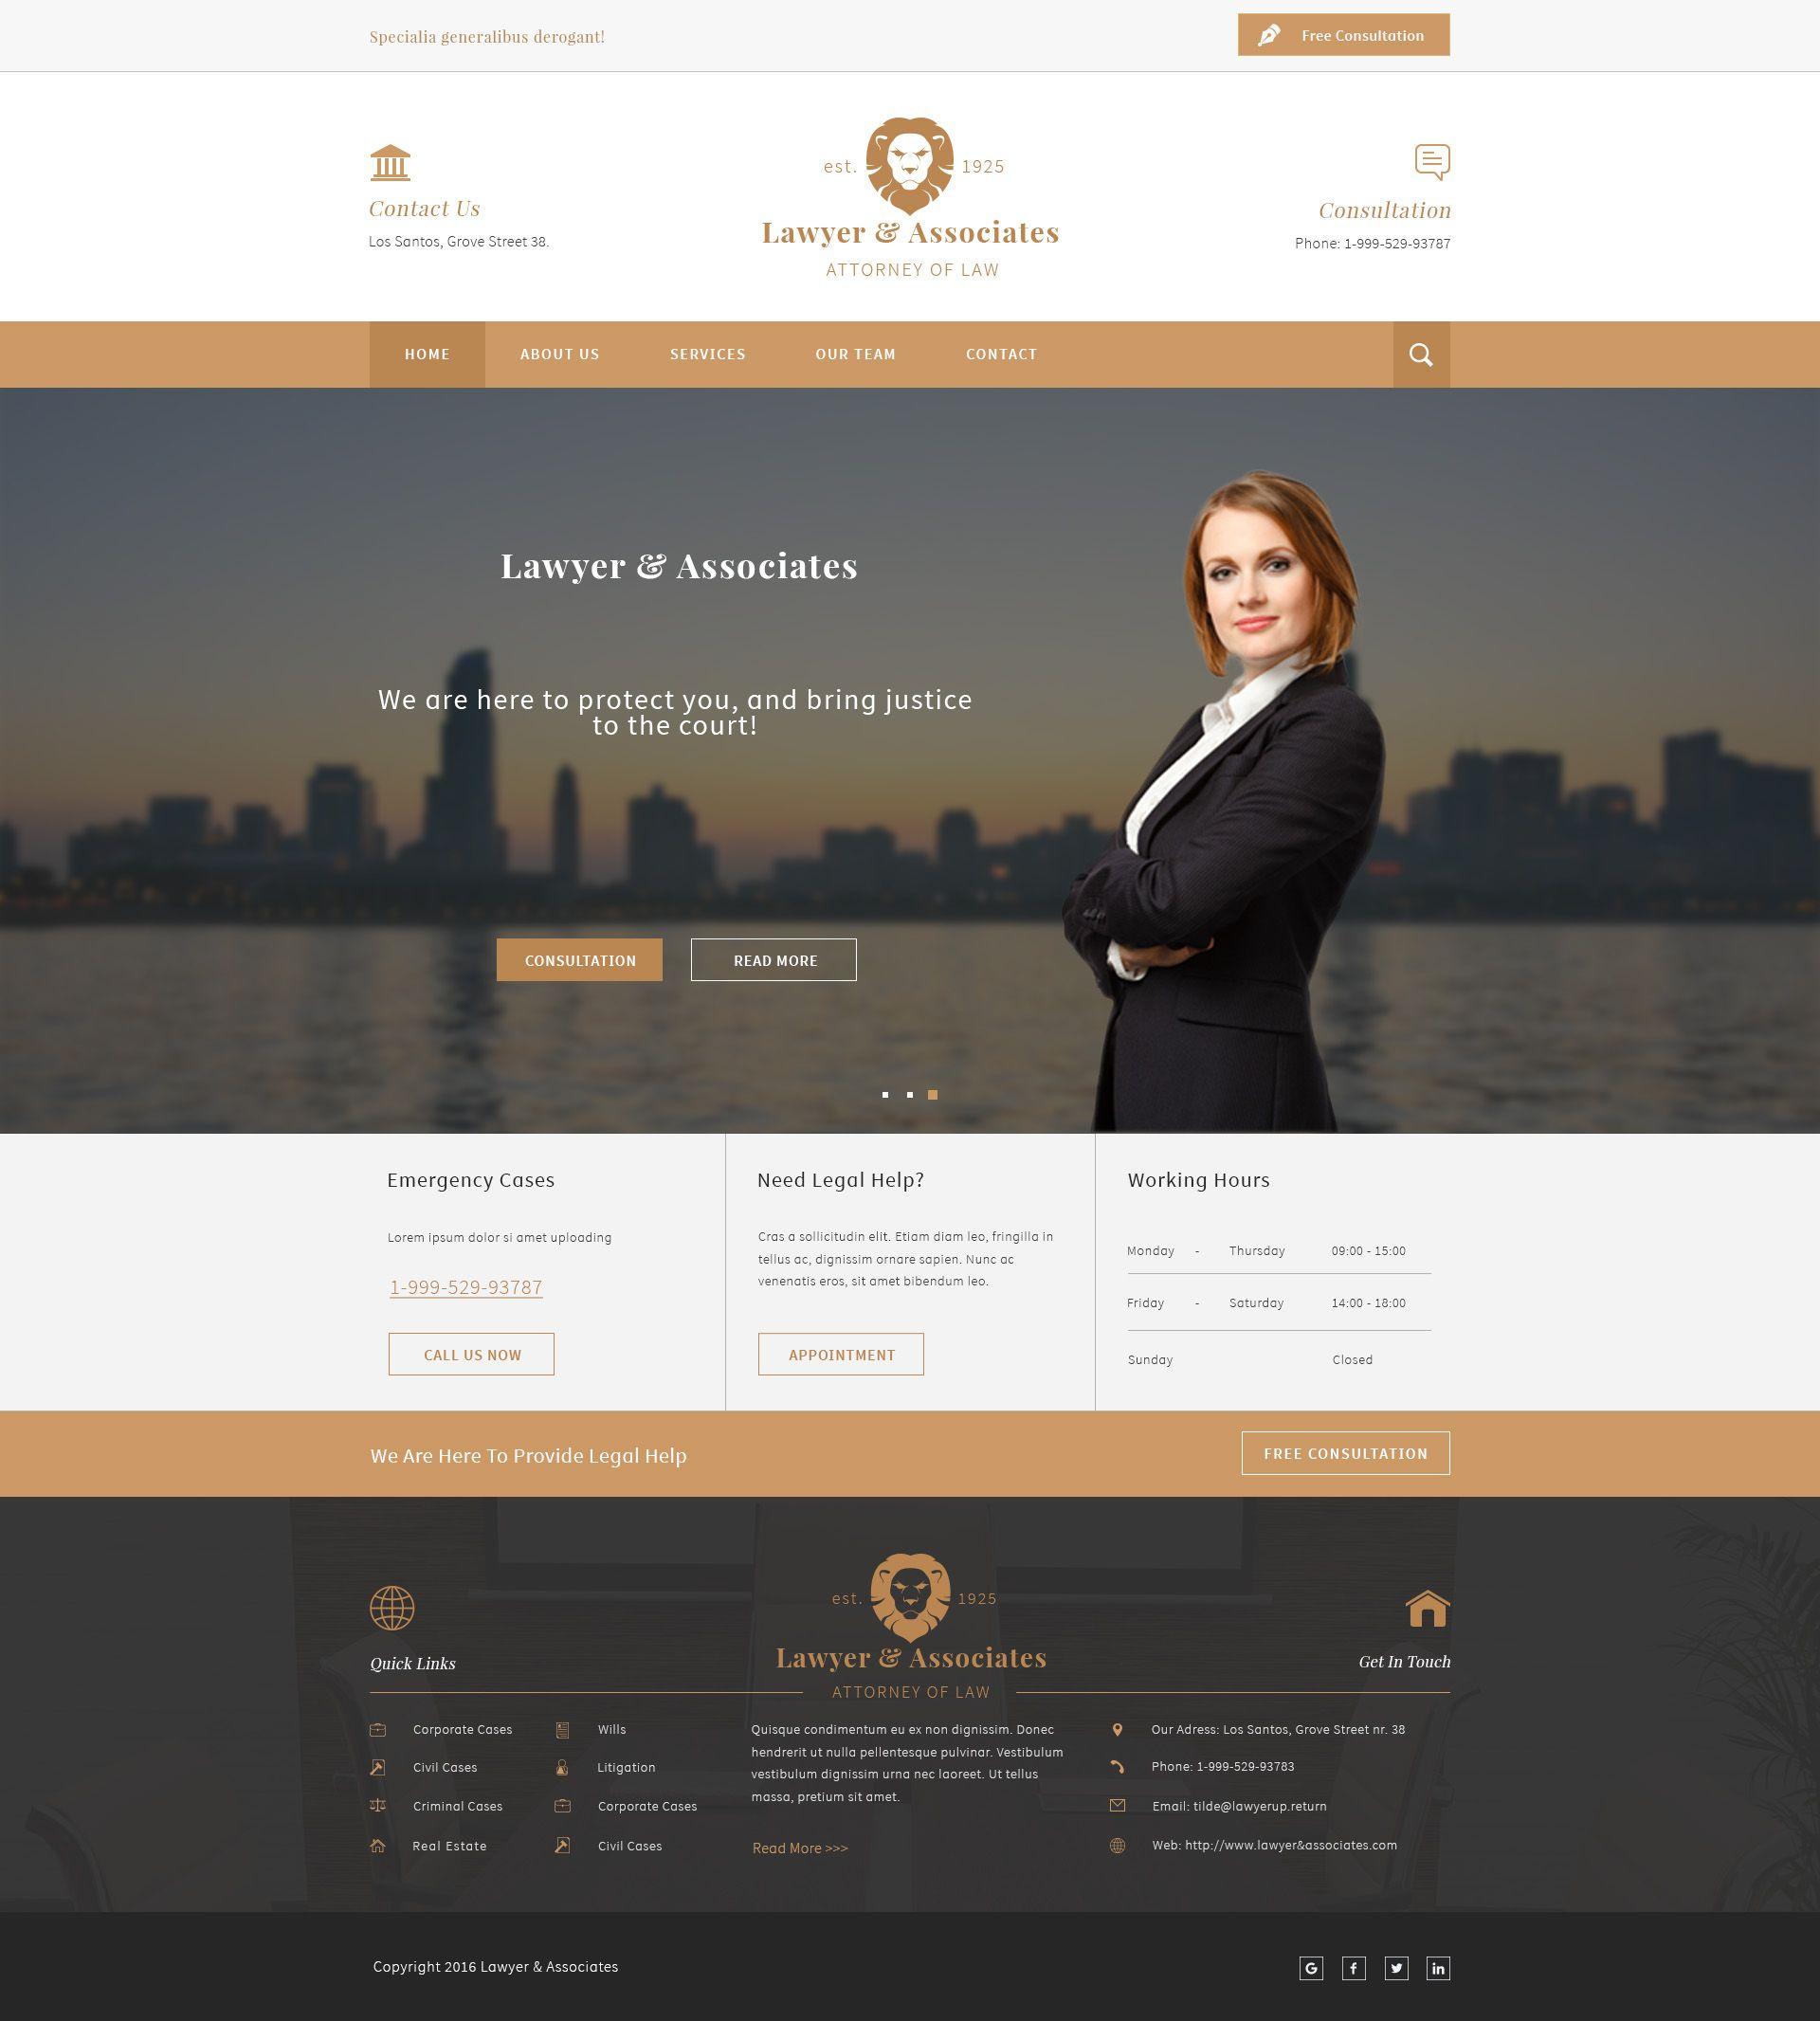 Lawyer Associates Attorney Law Company Psd Psd Law Firm Attorney Download Ht Lawyer Website Design Business Website Design Law Firm Website Design